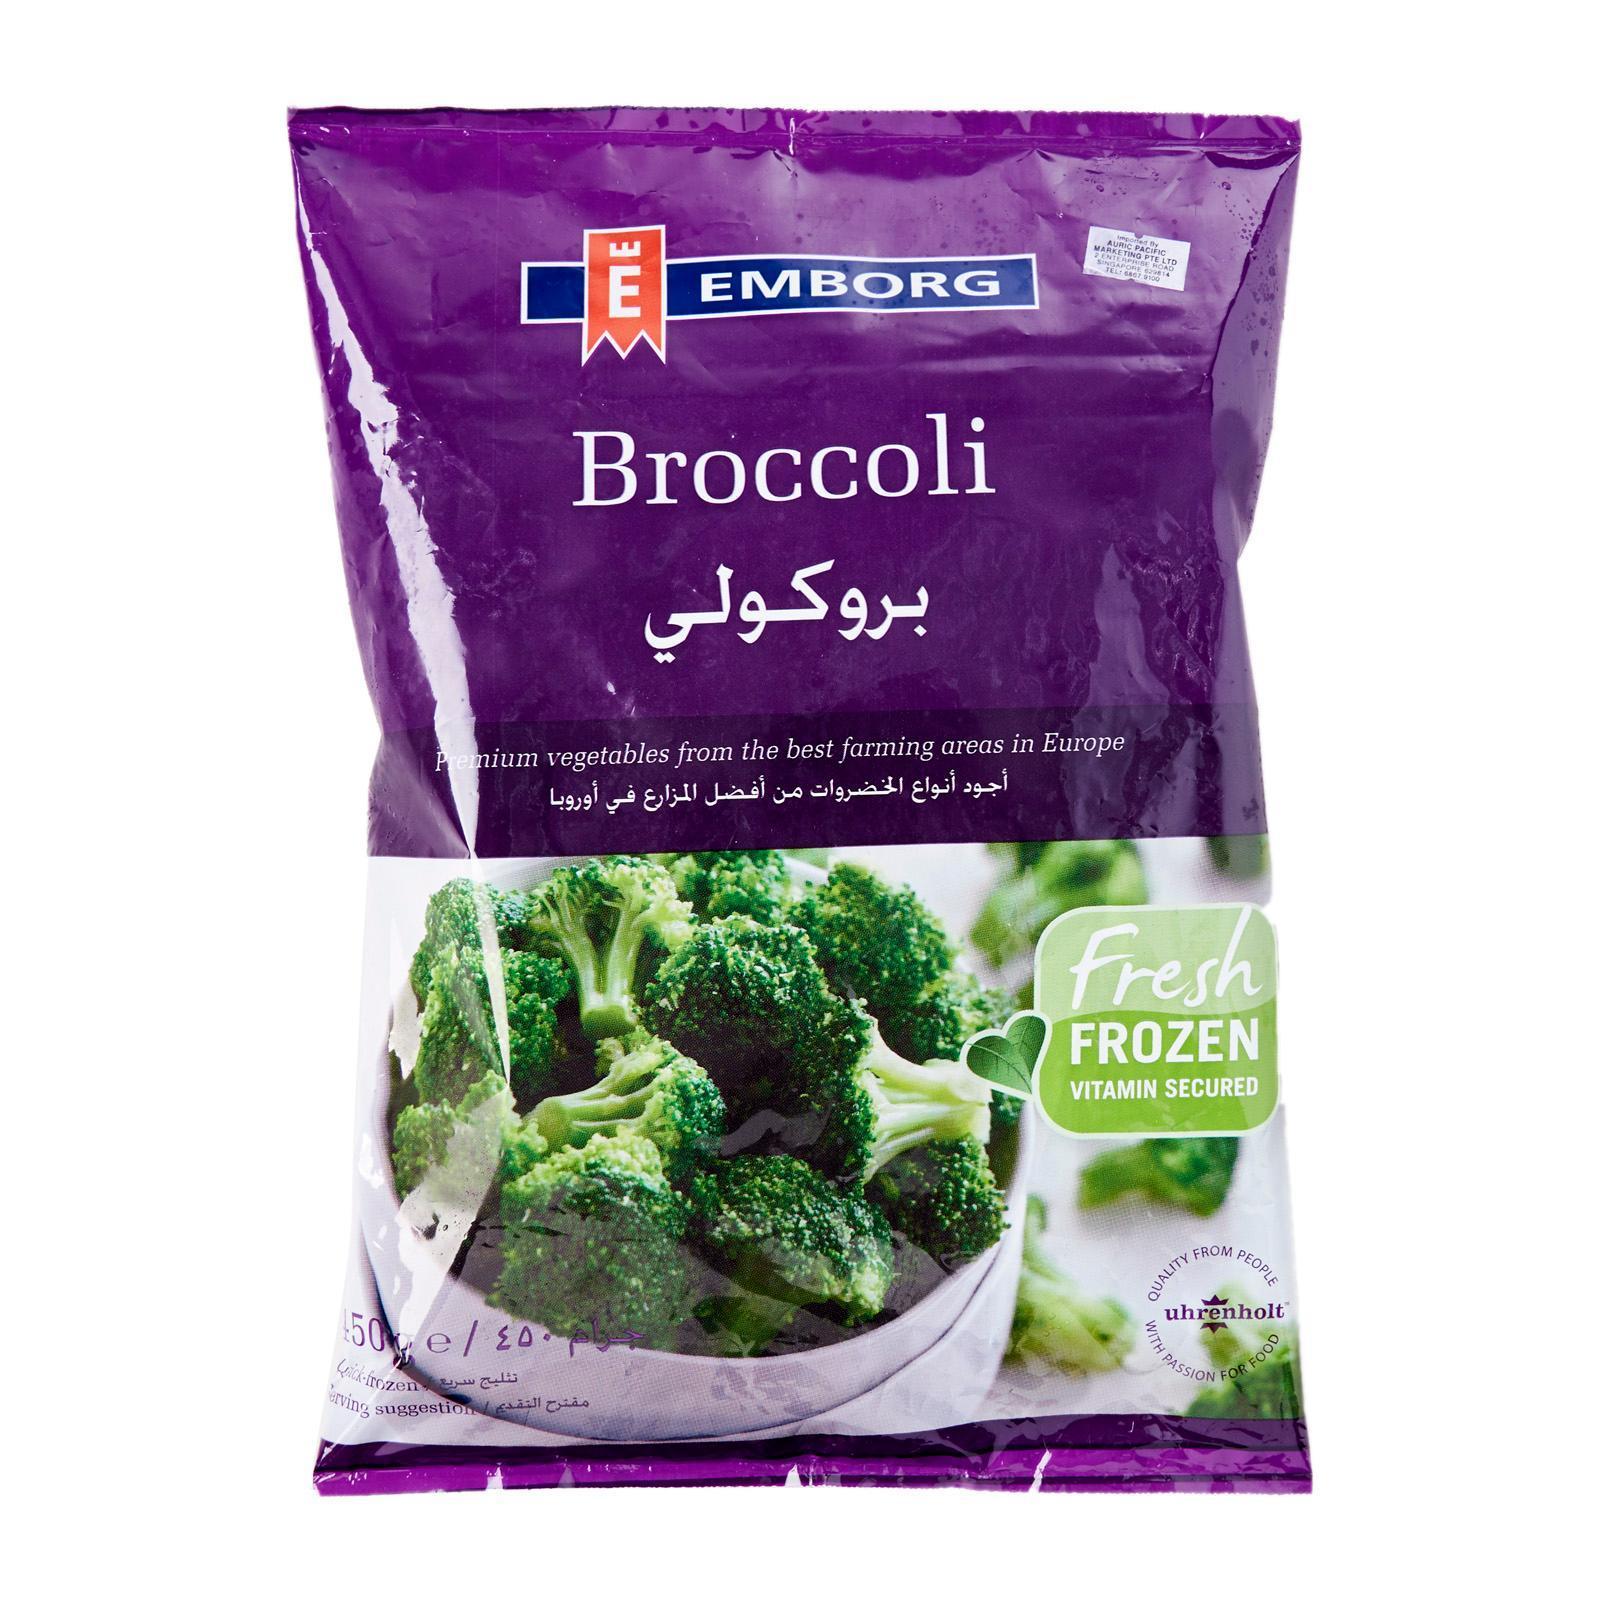 Emborg Broccoli Florets - Frozen By Redmart.